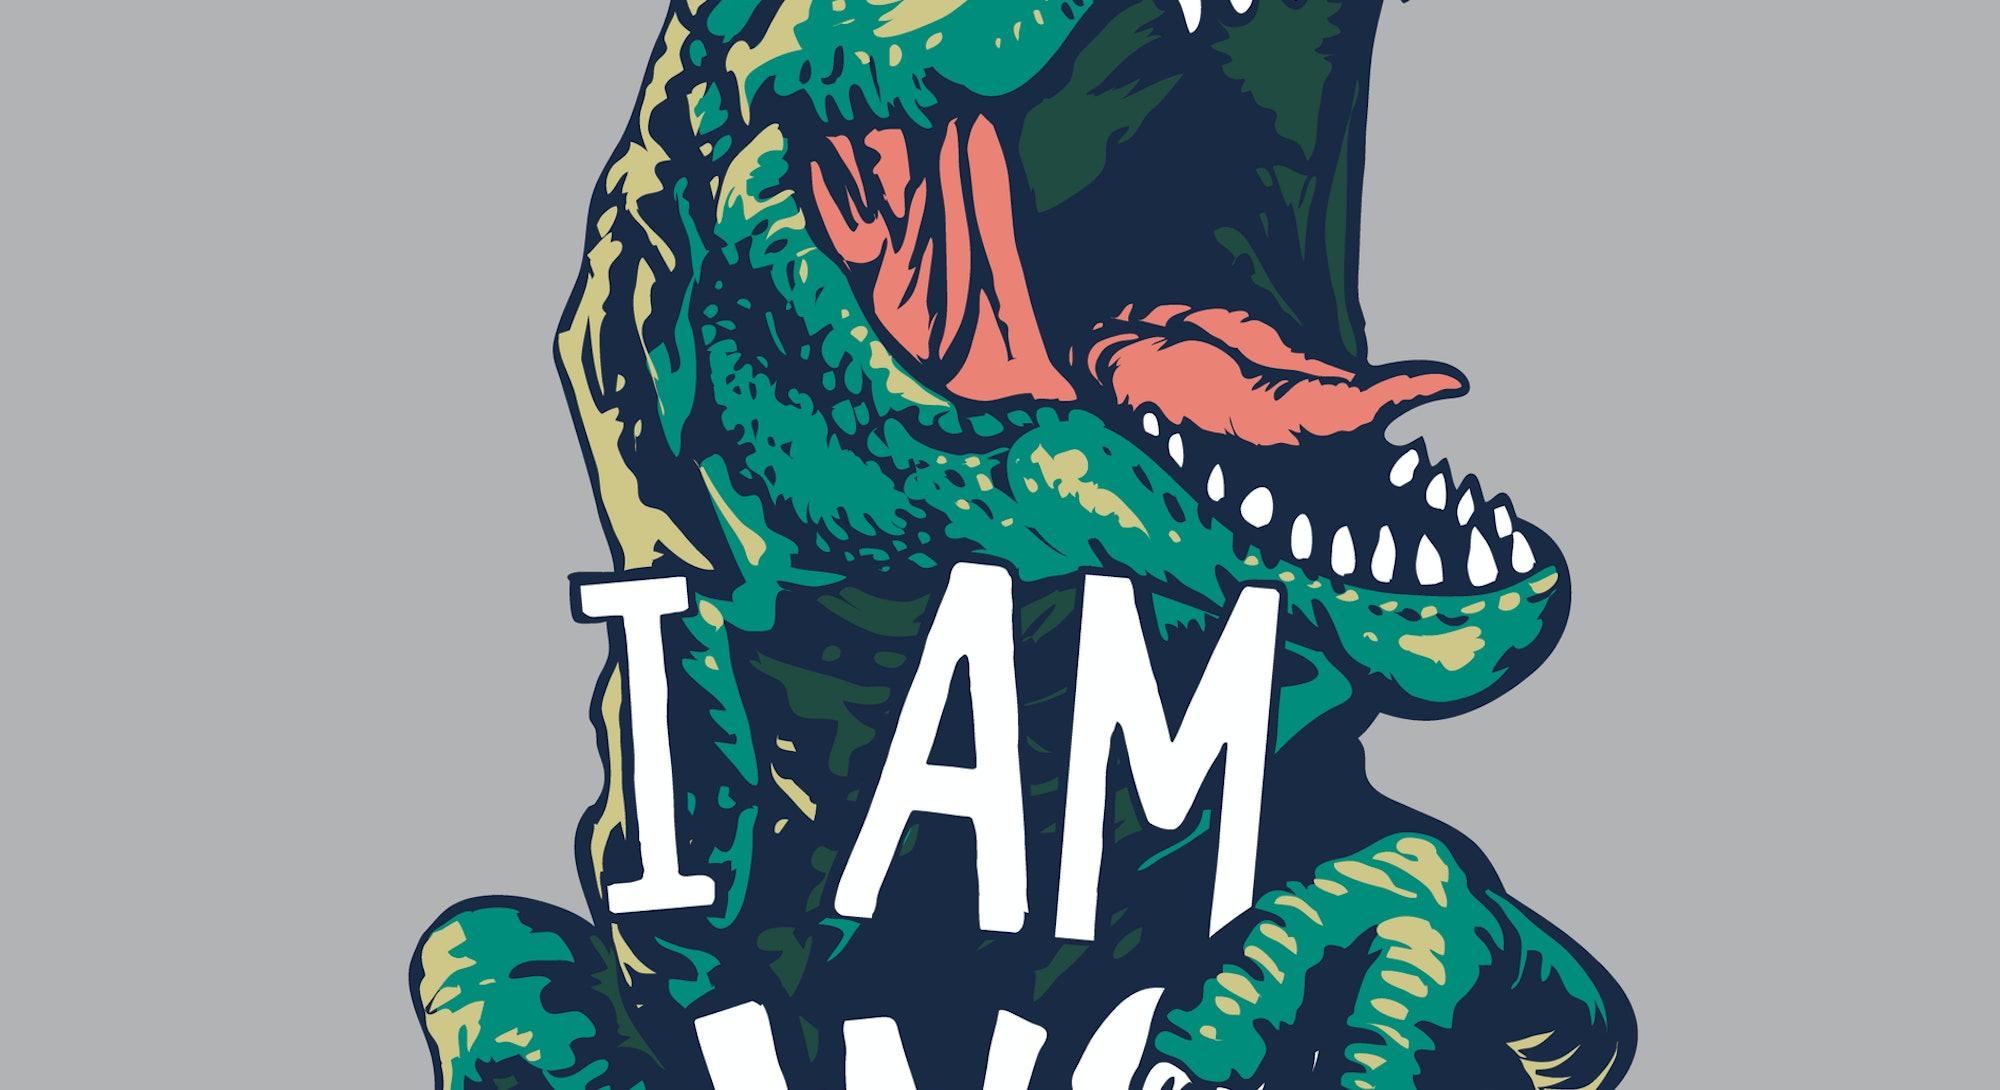 hungry slogan with dinosaur illustration